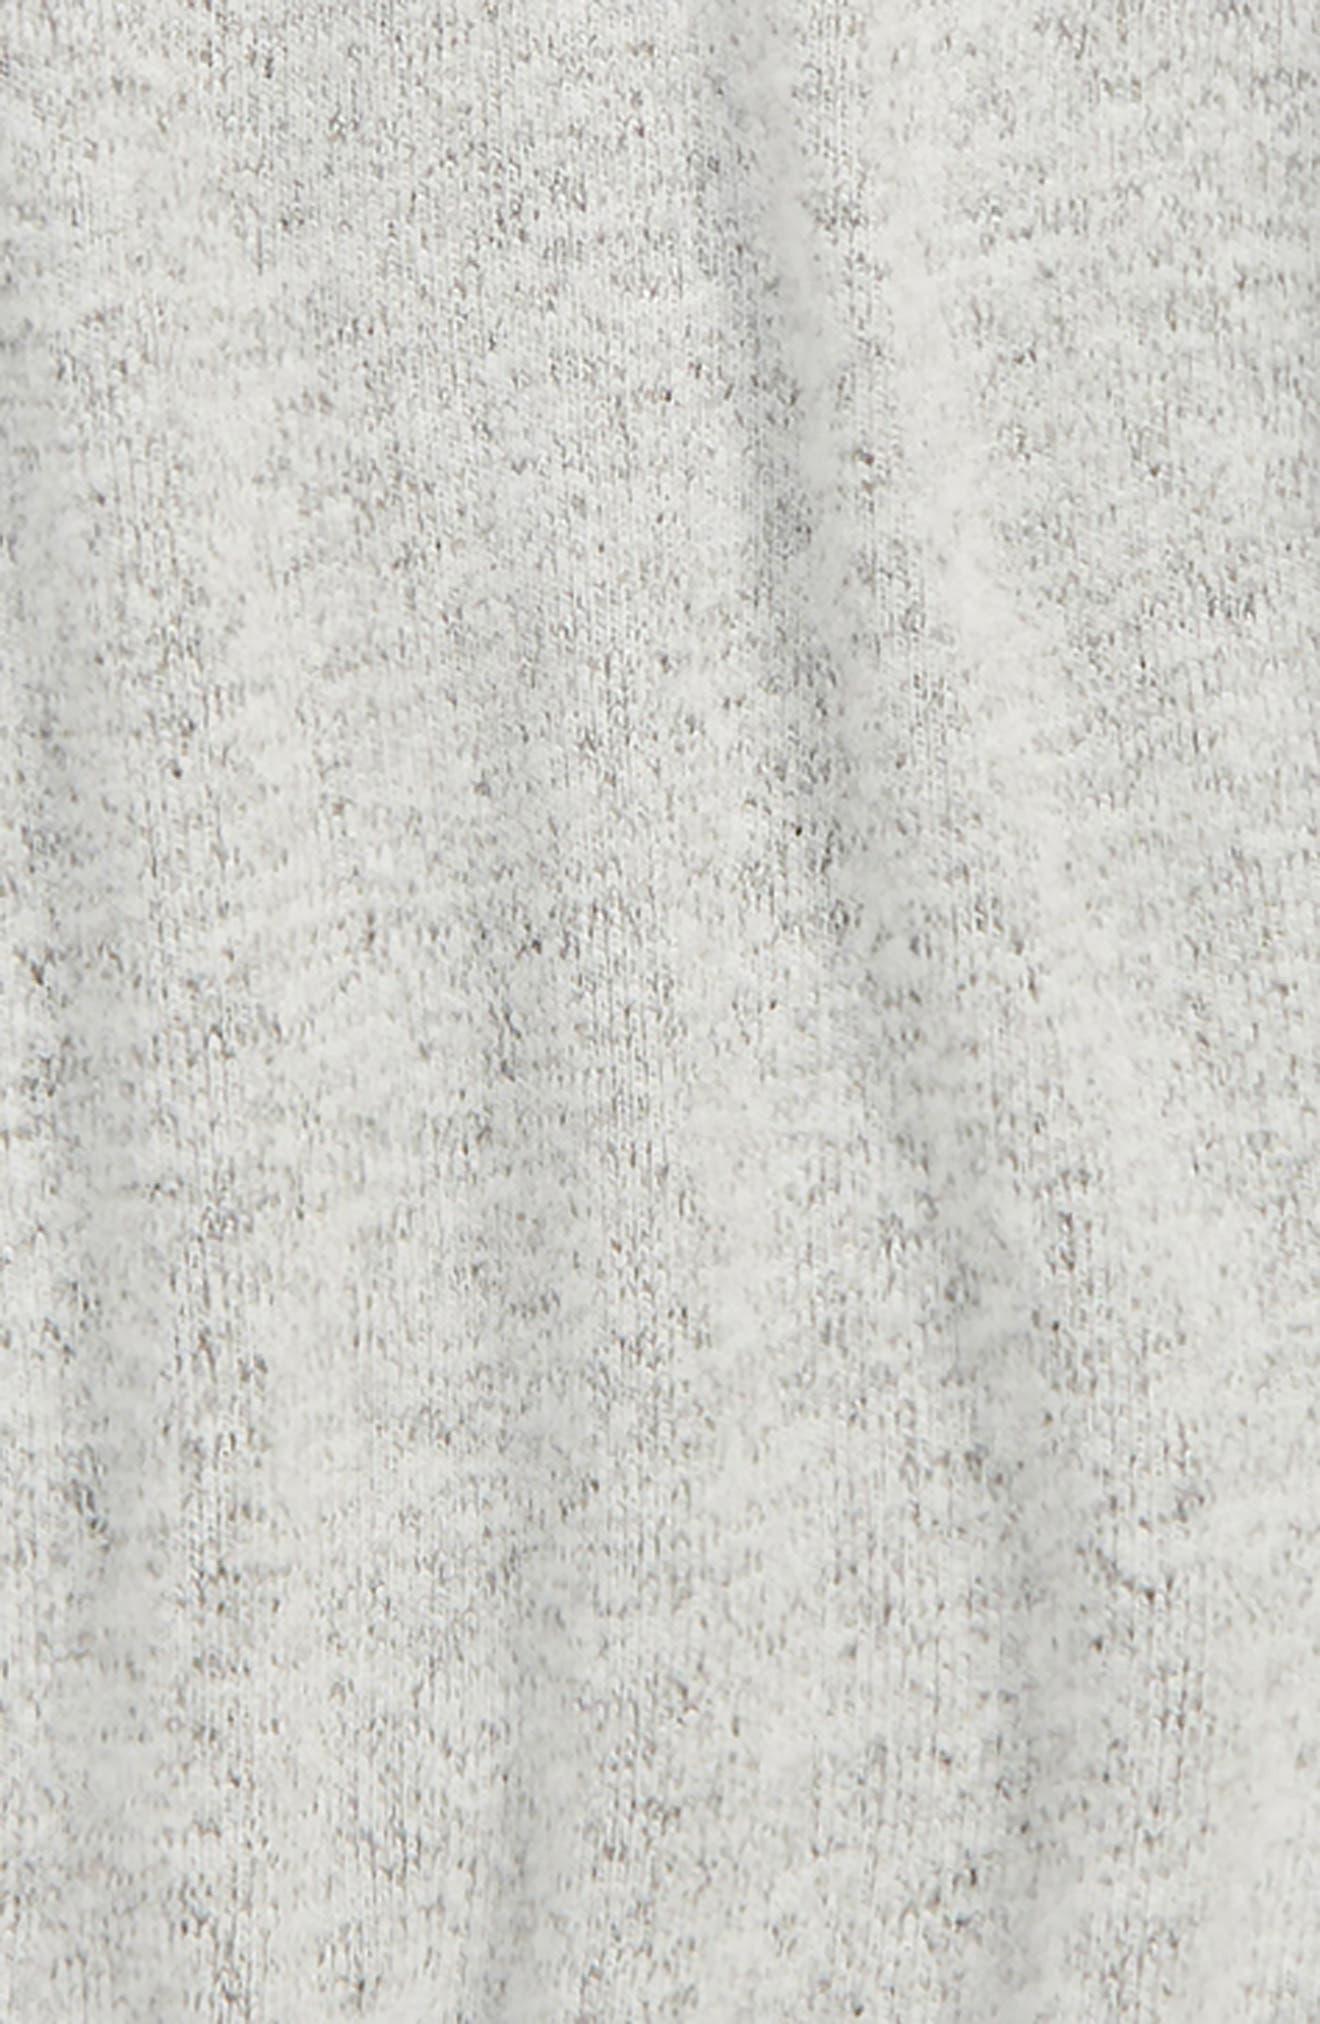 Ruffle Sleeve Knit Top,                             Alternate thumbnail 2, color,                             030